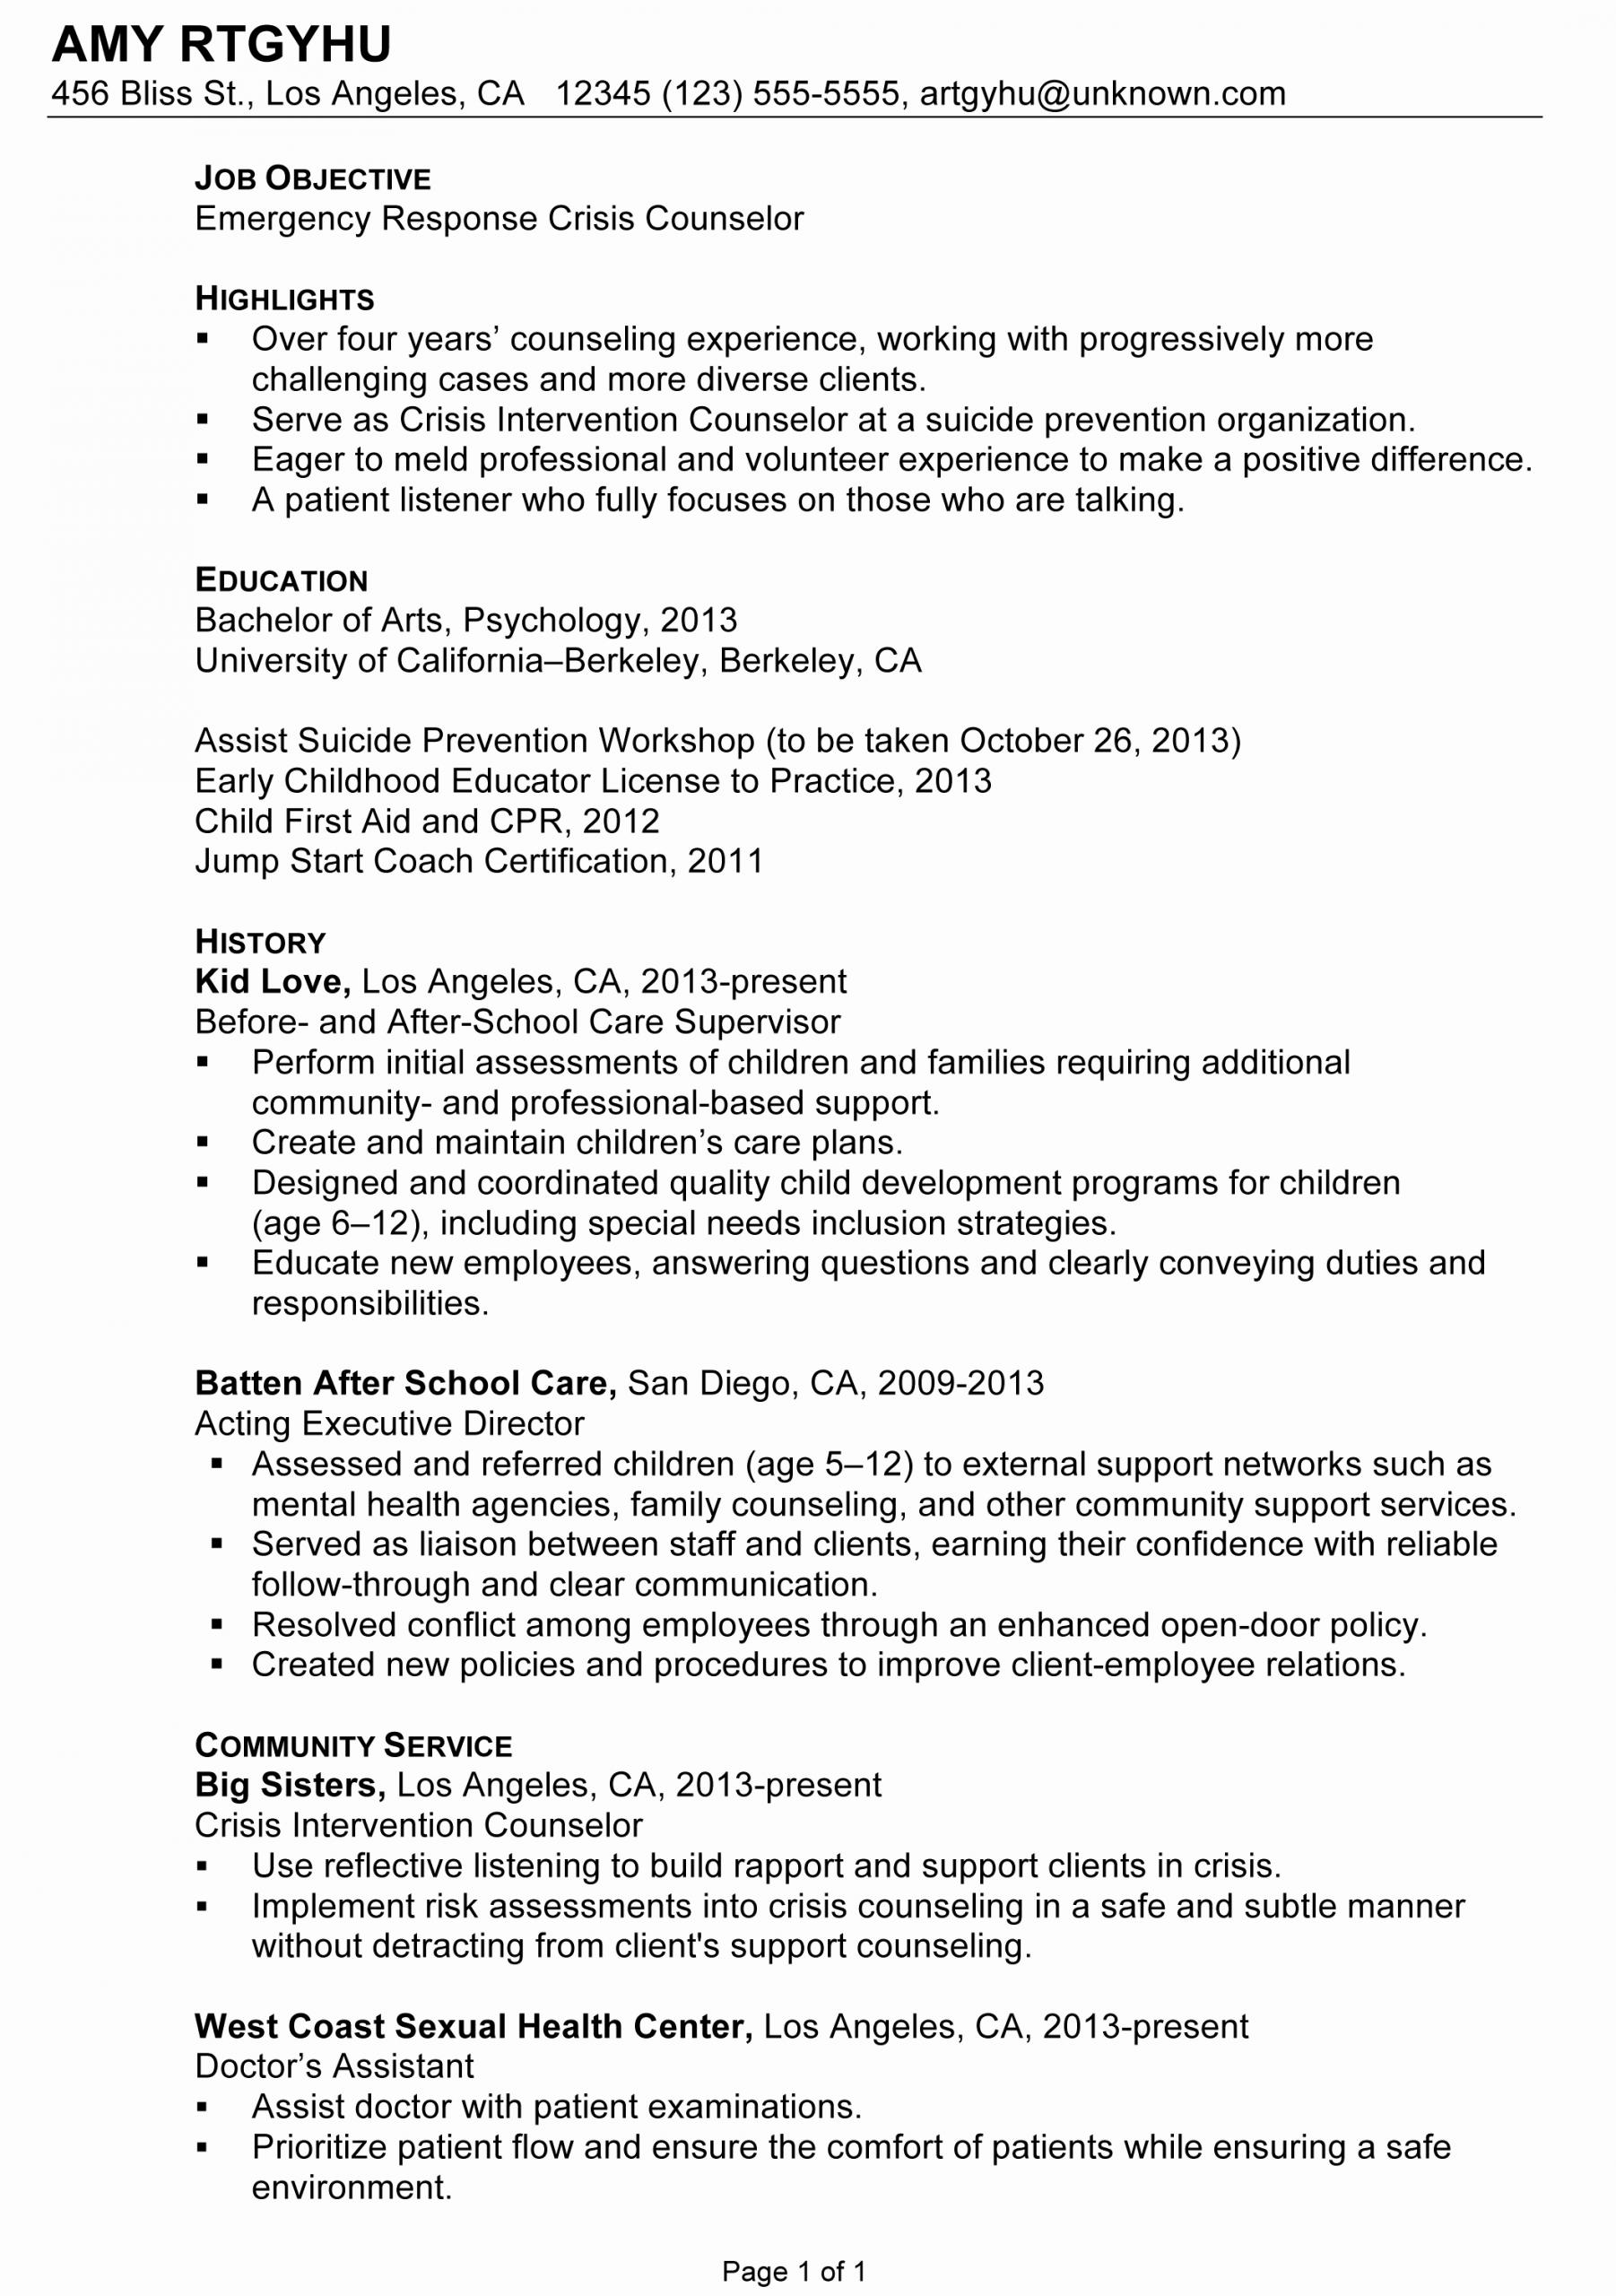 Pin Di Top Modern Resume Design 2020